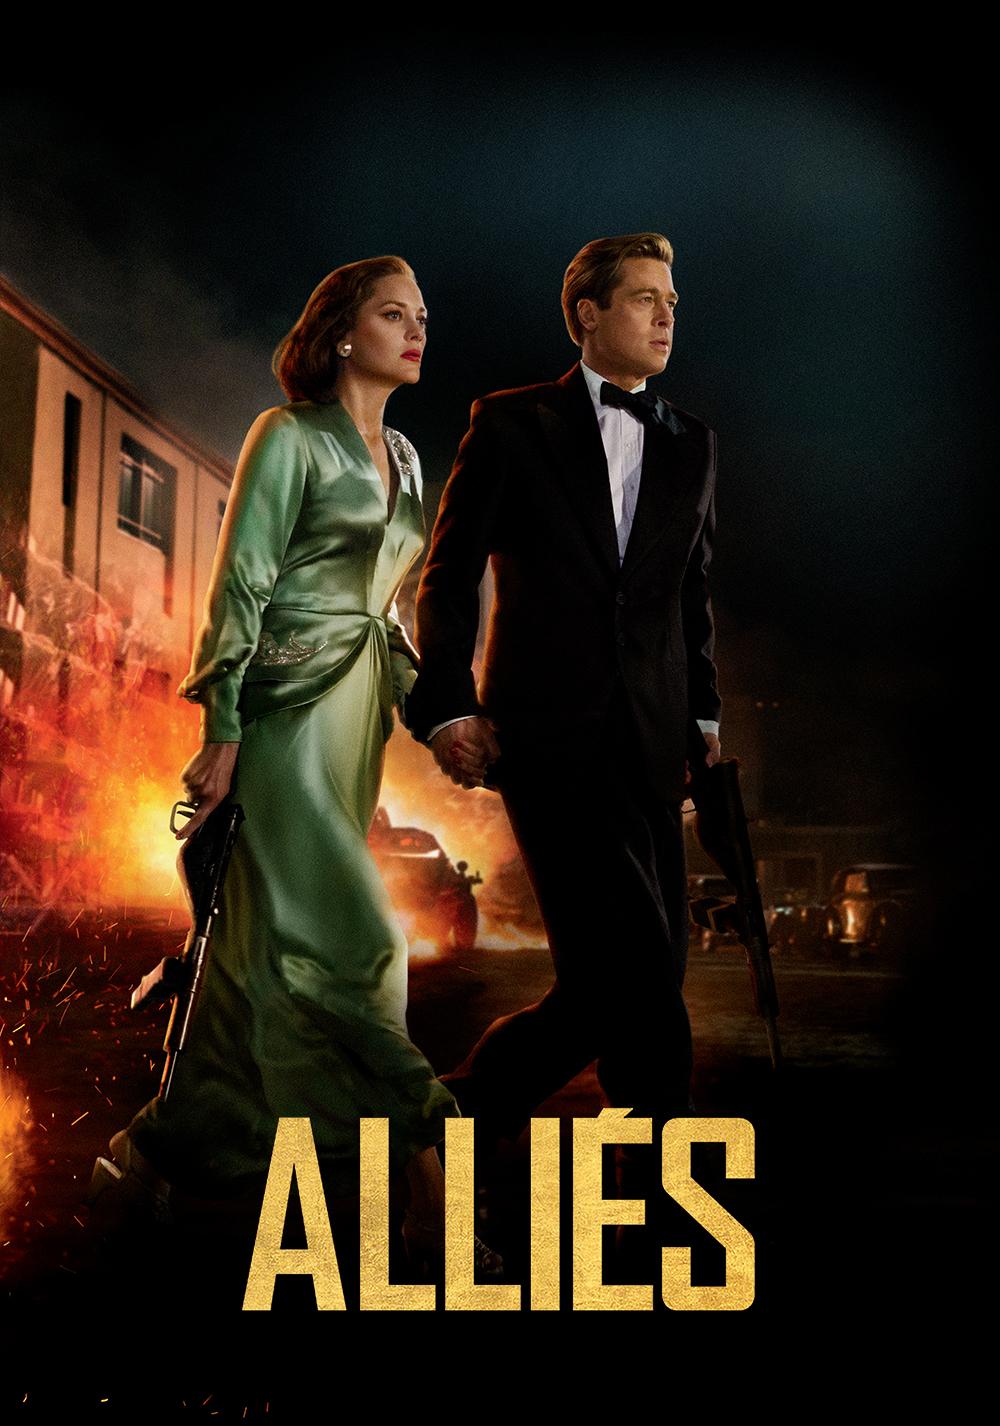 Allied | Movie fanart ...